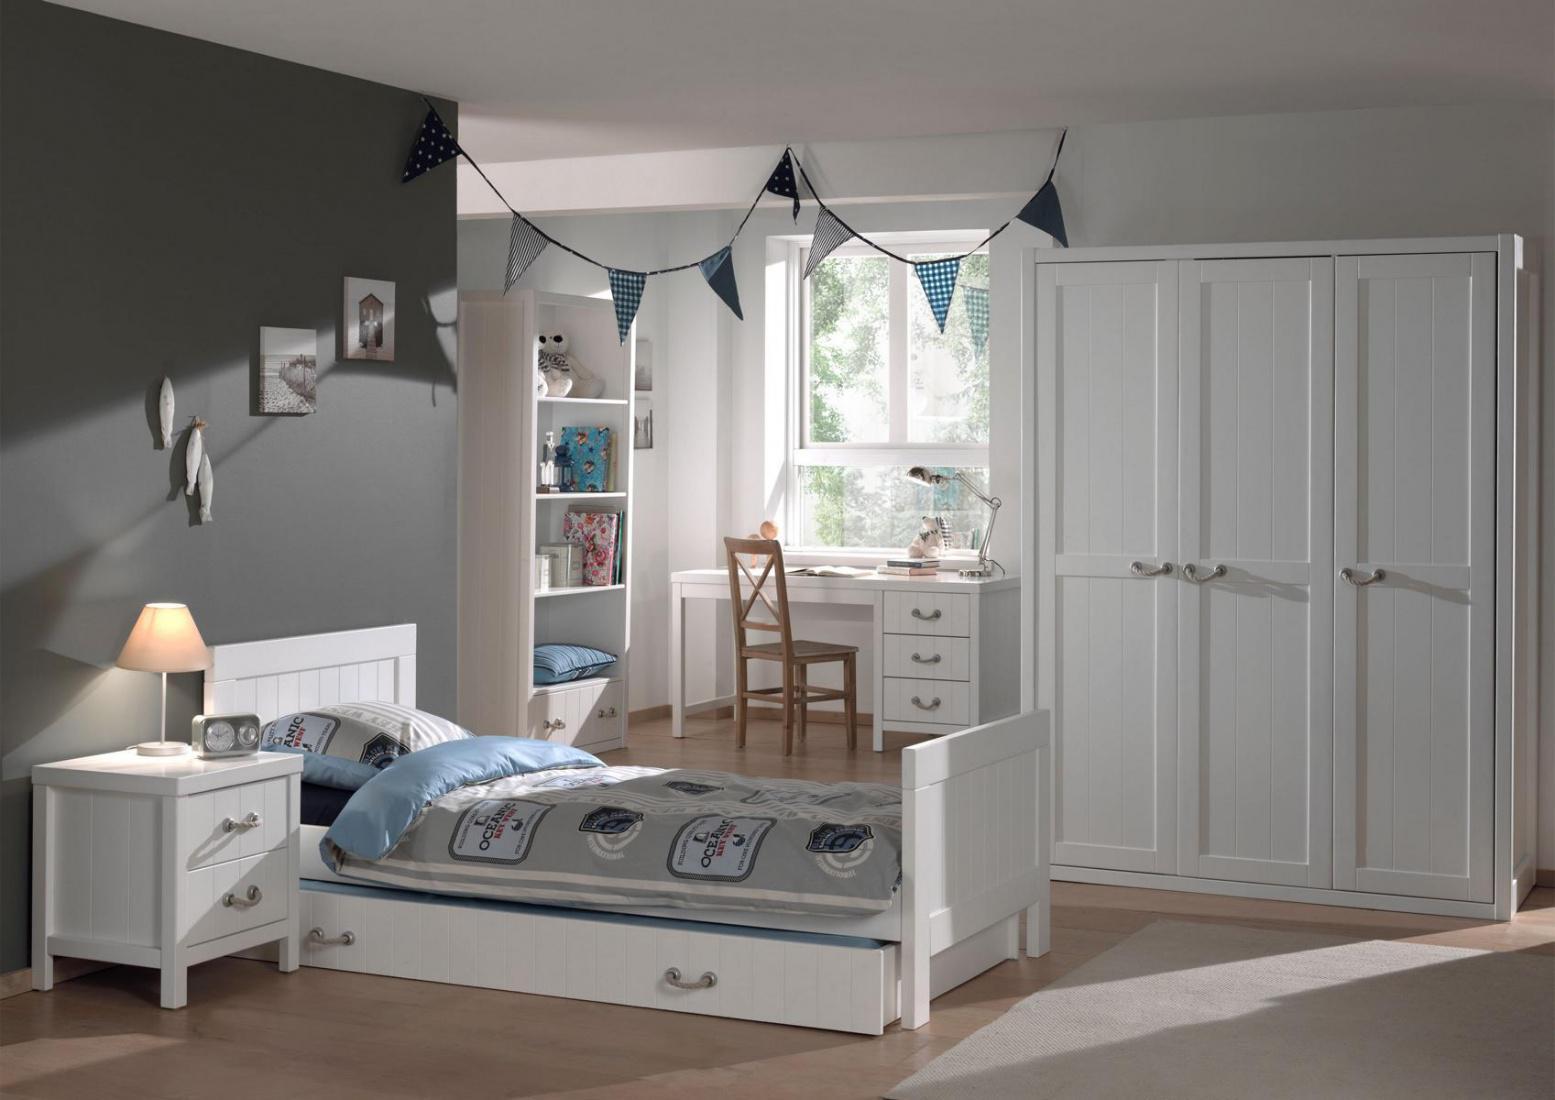 jugendzimmer set iny 6 teilig in wei mdf kaufen bei m bel lux. Black Bedroom Furniture Sets. Home Design Ideas